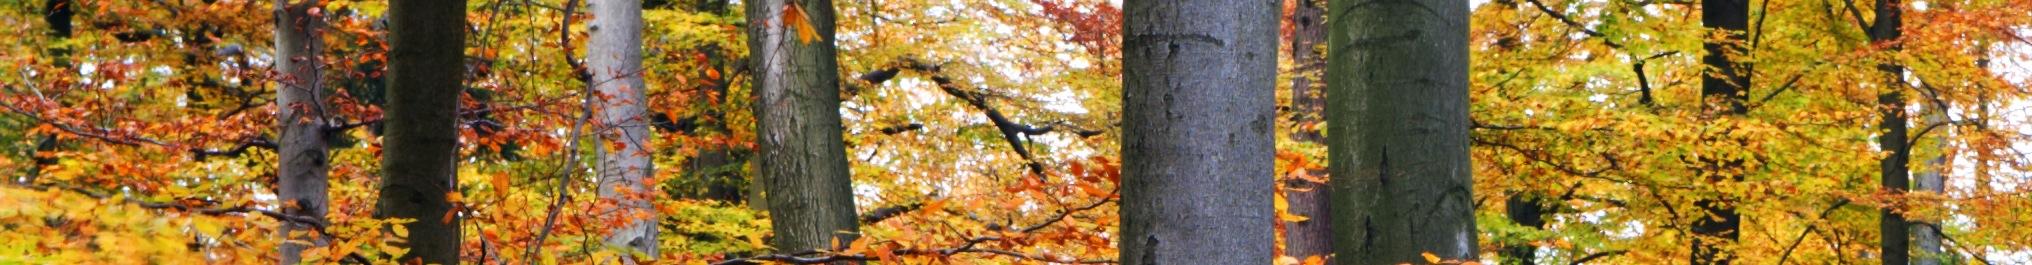 yellow_leaf_trees2.jpg